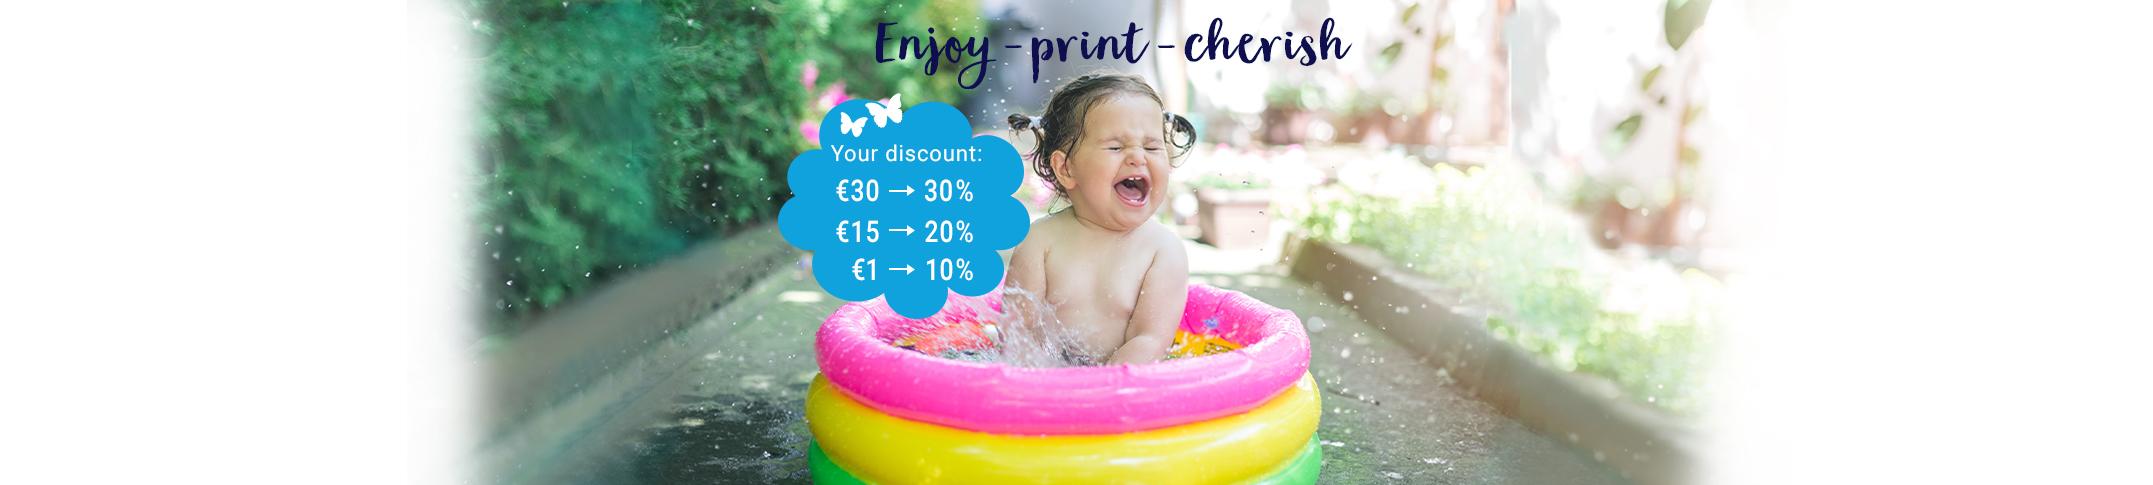 Prints & Posters - Make hardcopies of your wonderful memories!